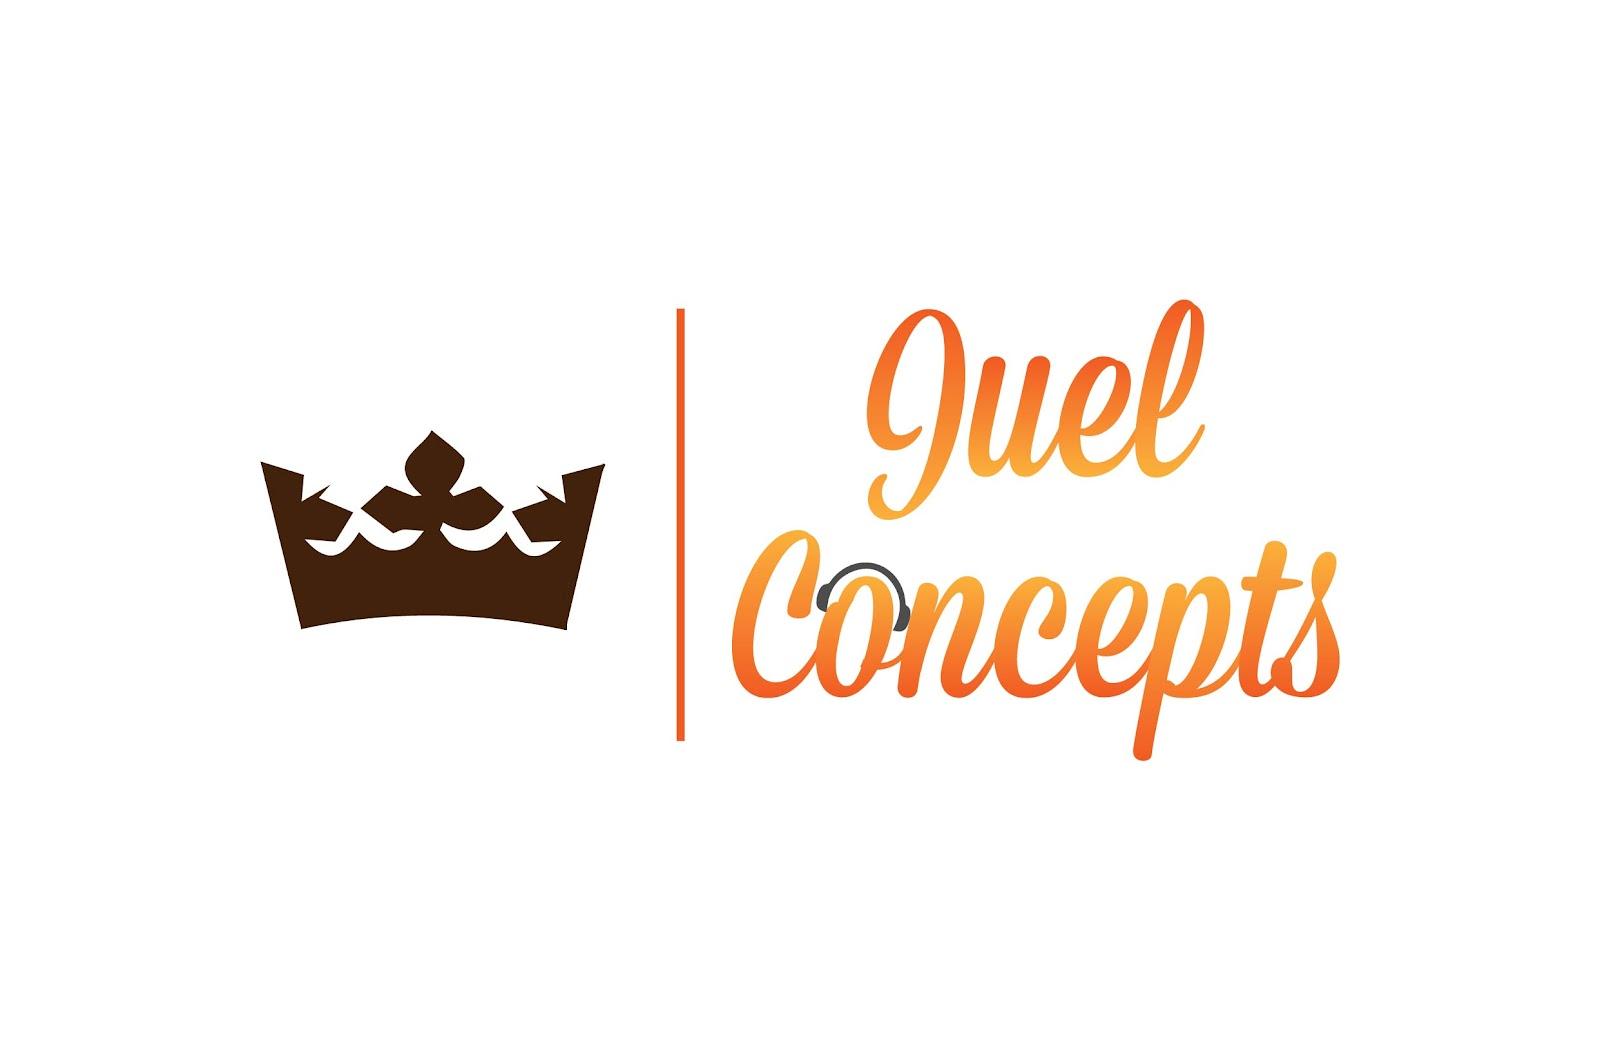 juel concepts logo FINAL 2015.jpg